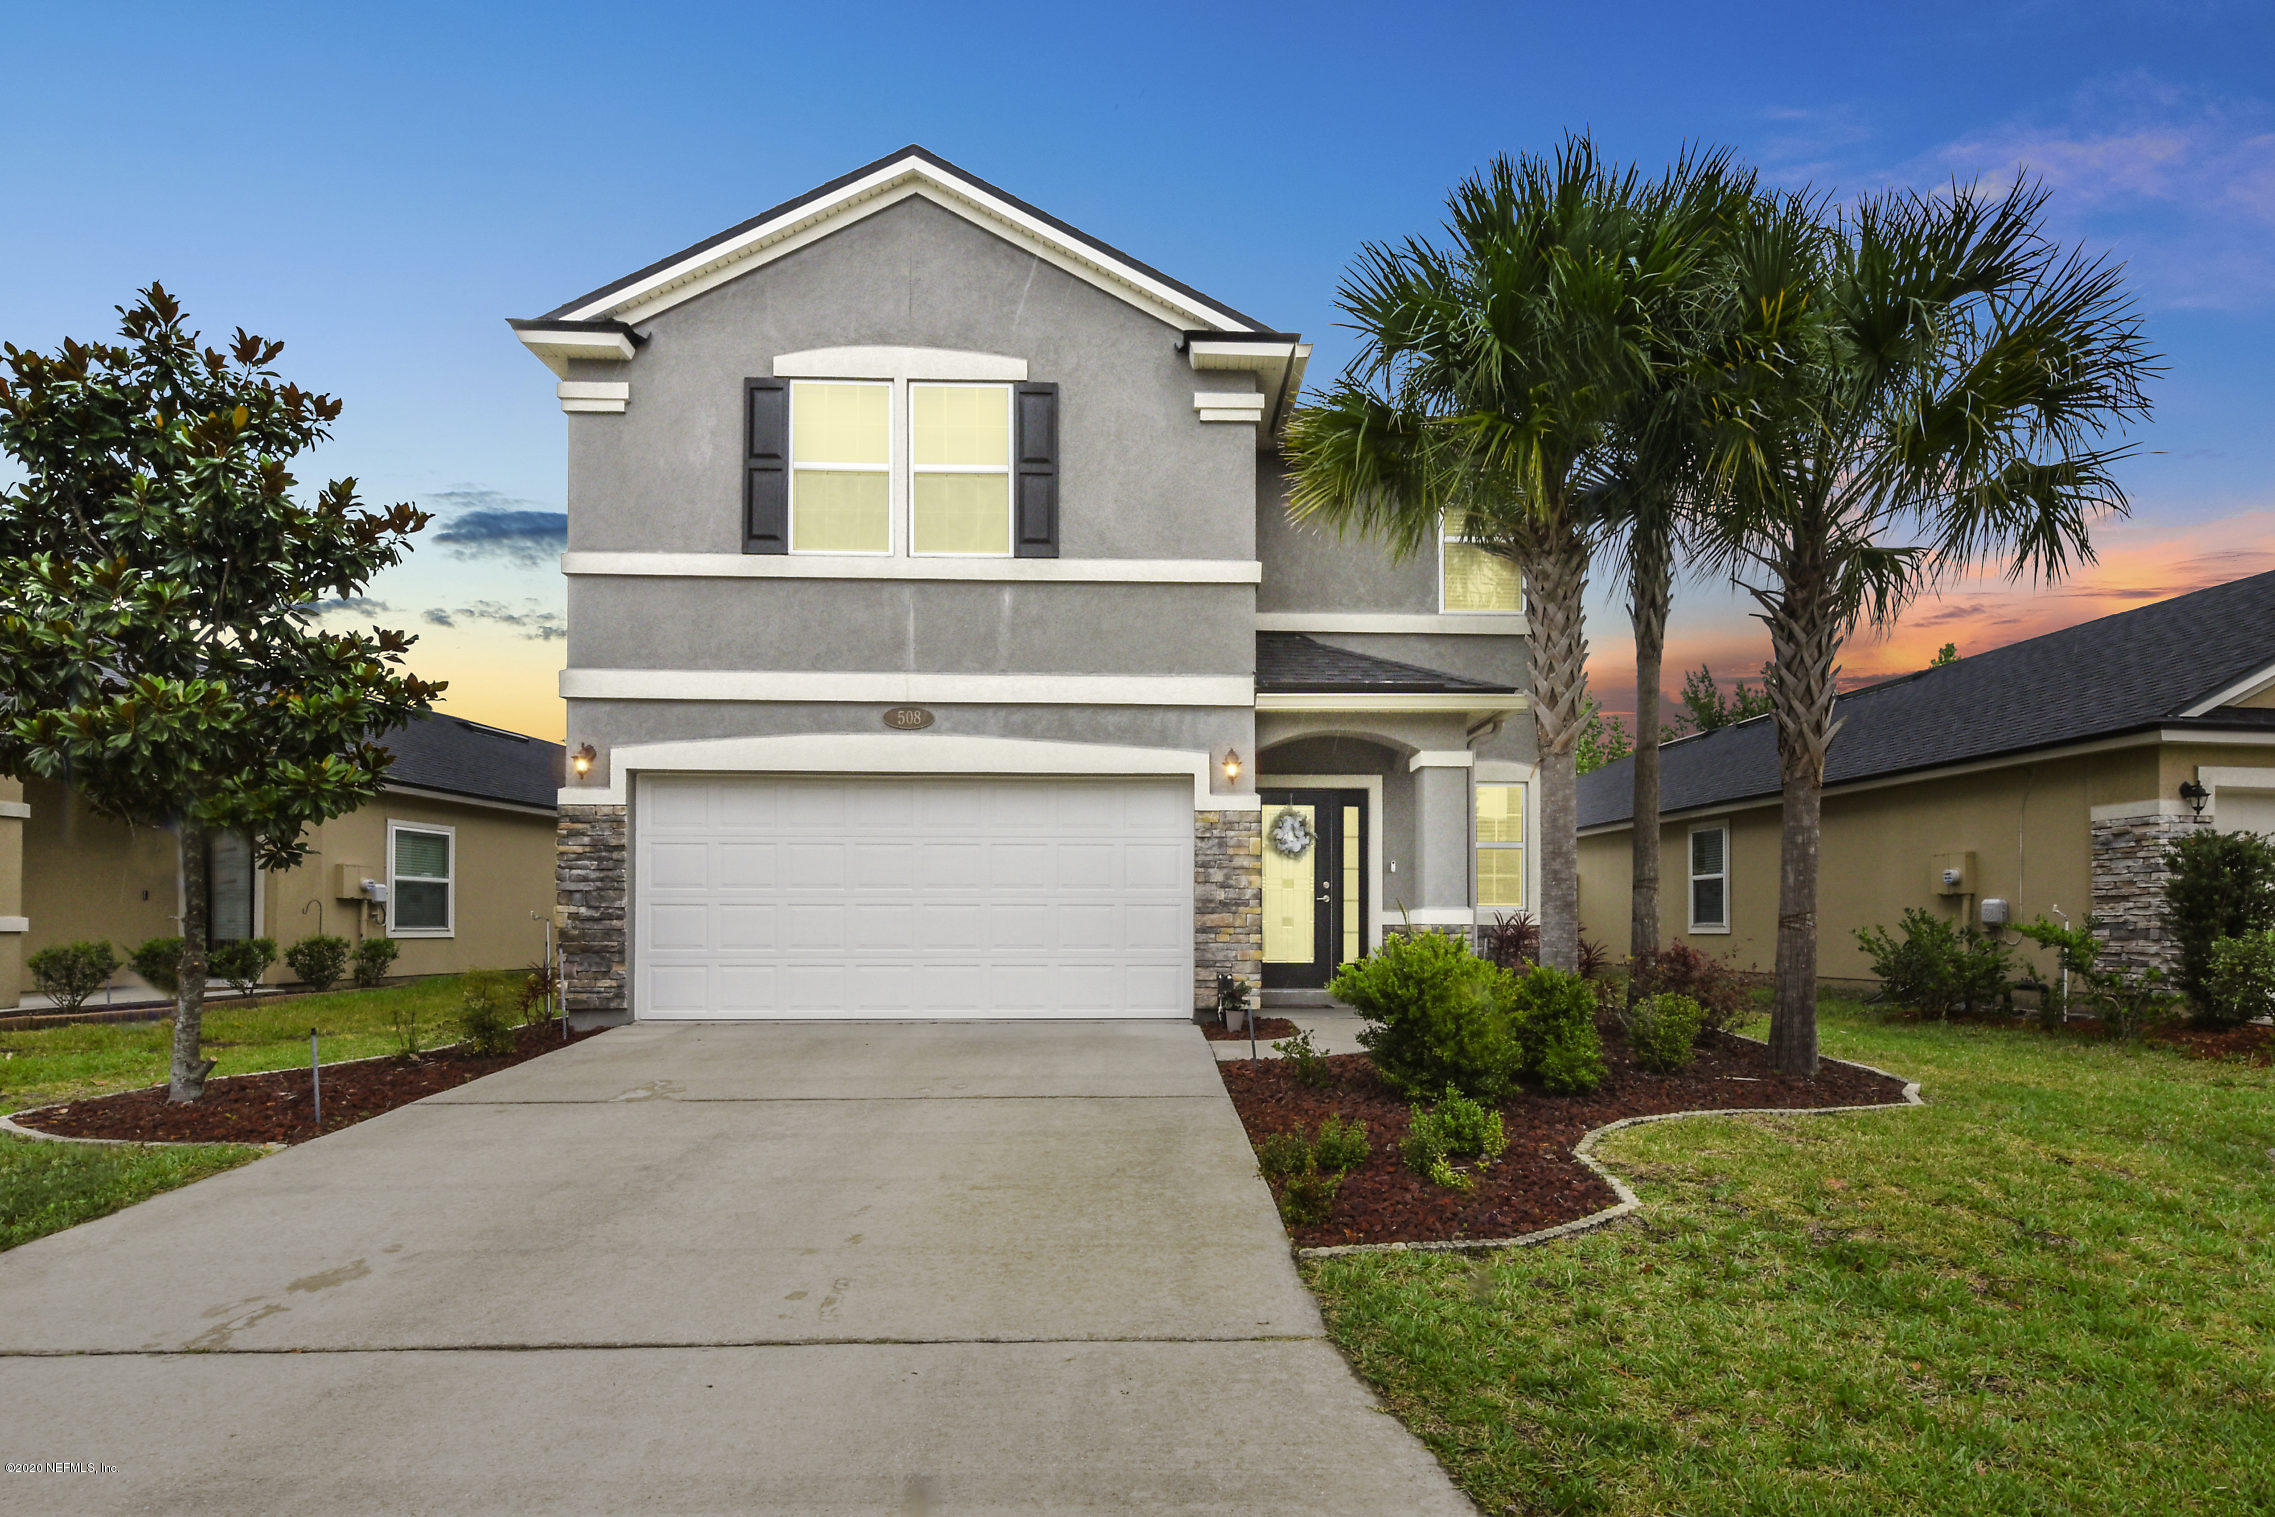 508 DEERCROFT, ORANGE PARK, FLORIDA 32065, 4 Bedrooms Bedrooms, ,2 BathroomsBathrooms,Residential,For sale,DEERCROFT,1055322